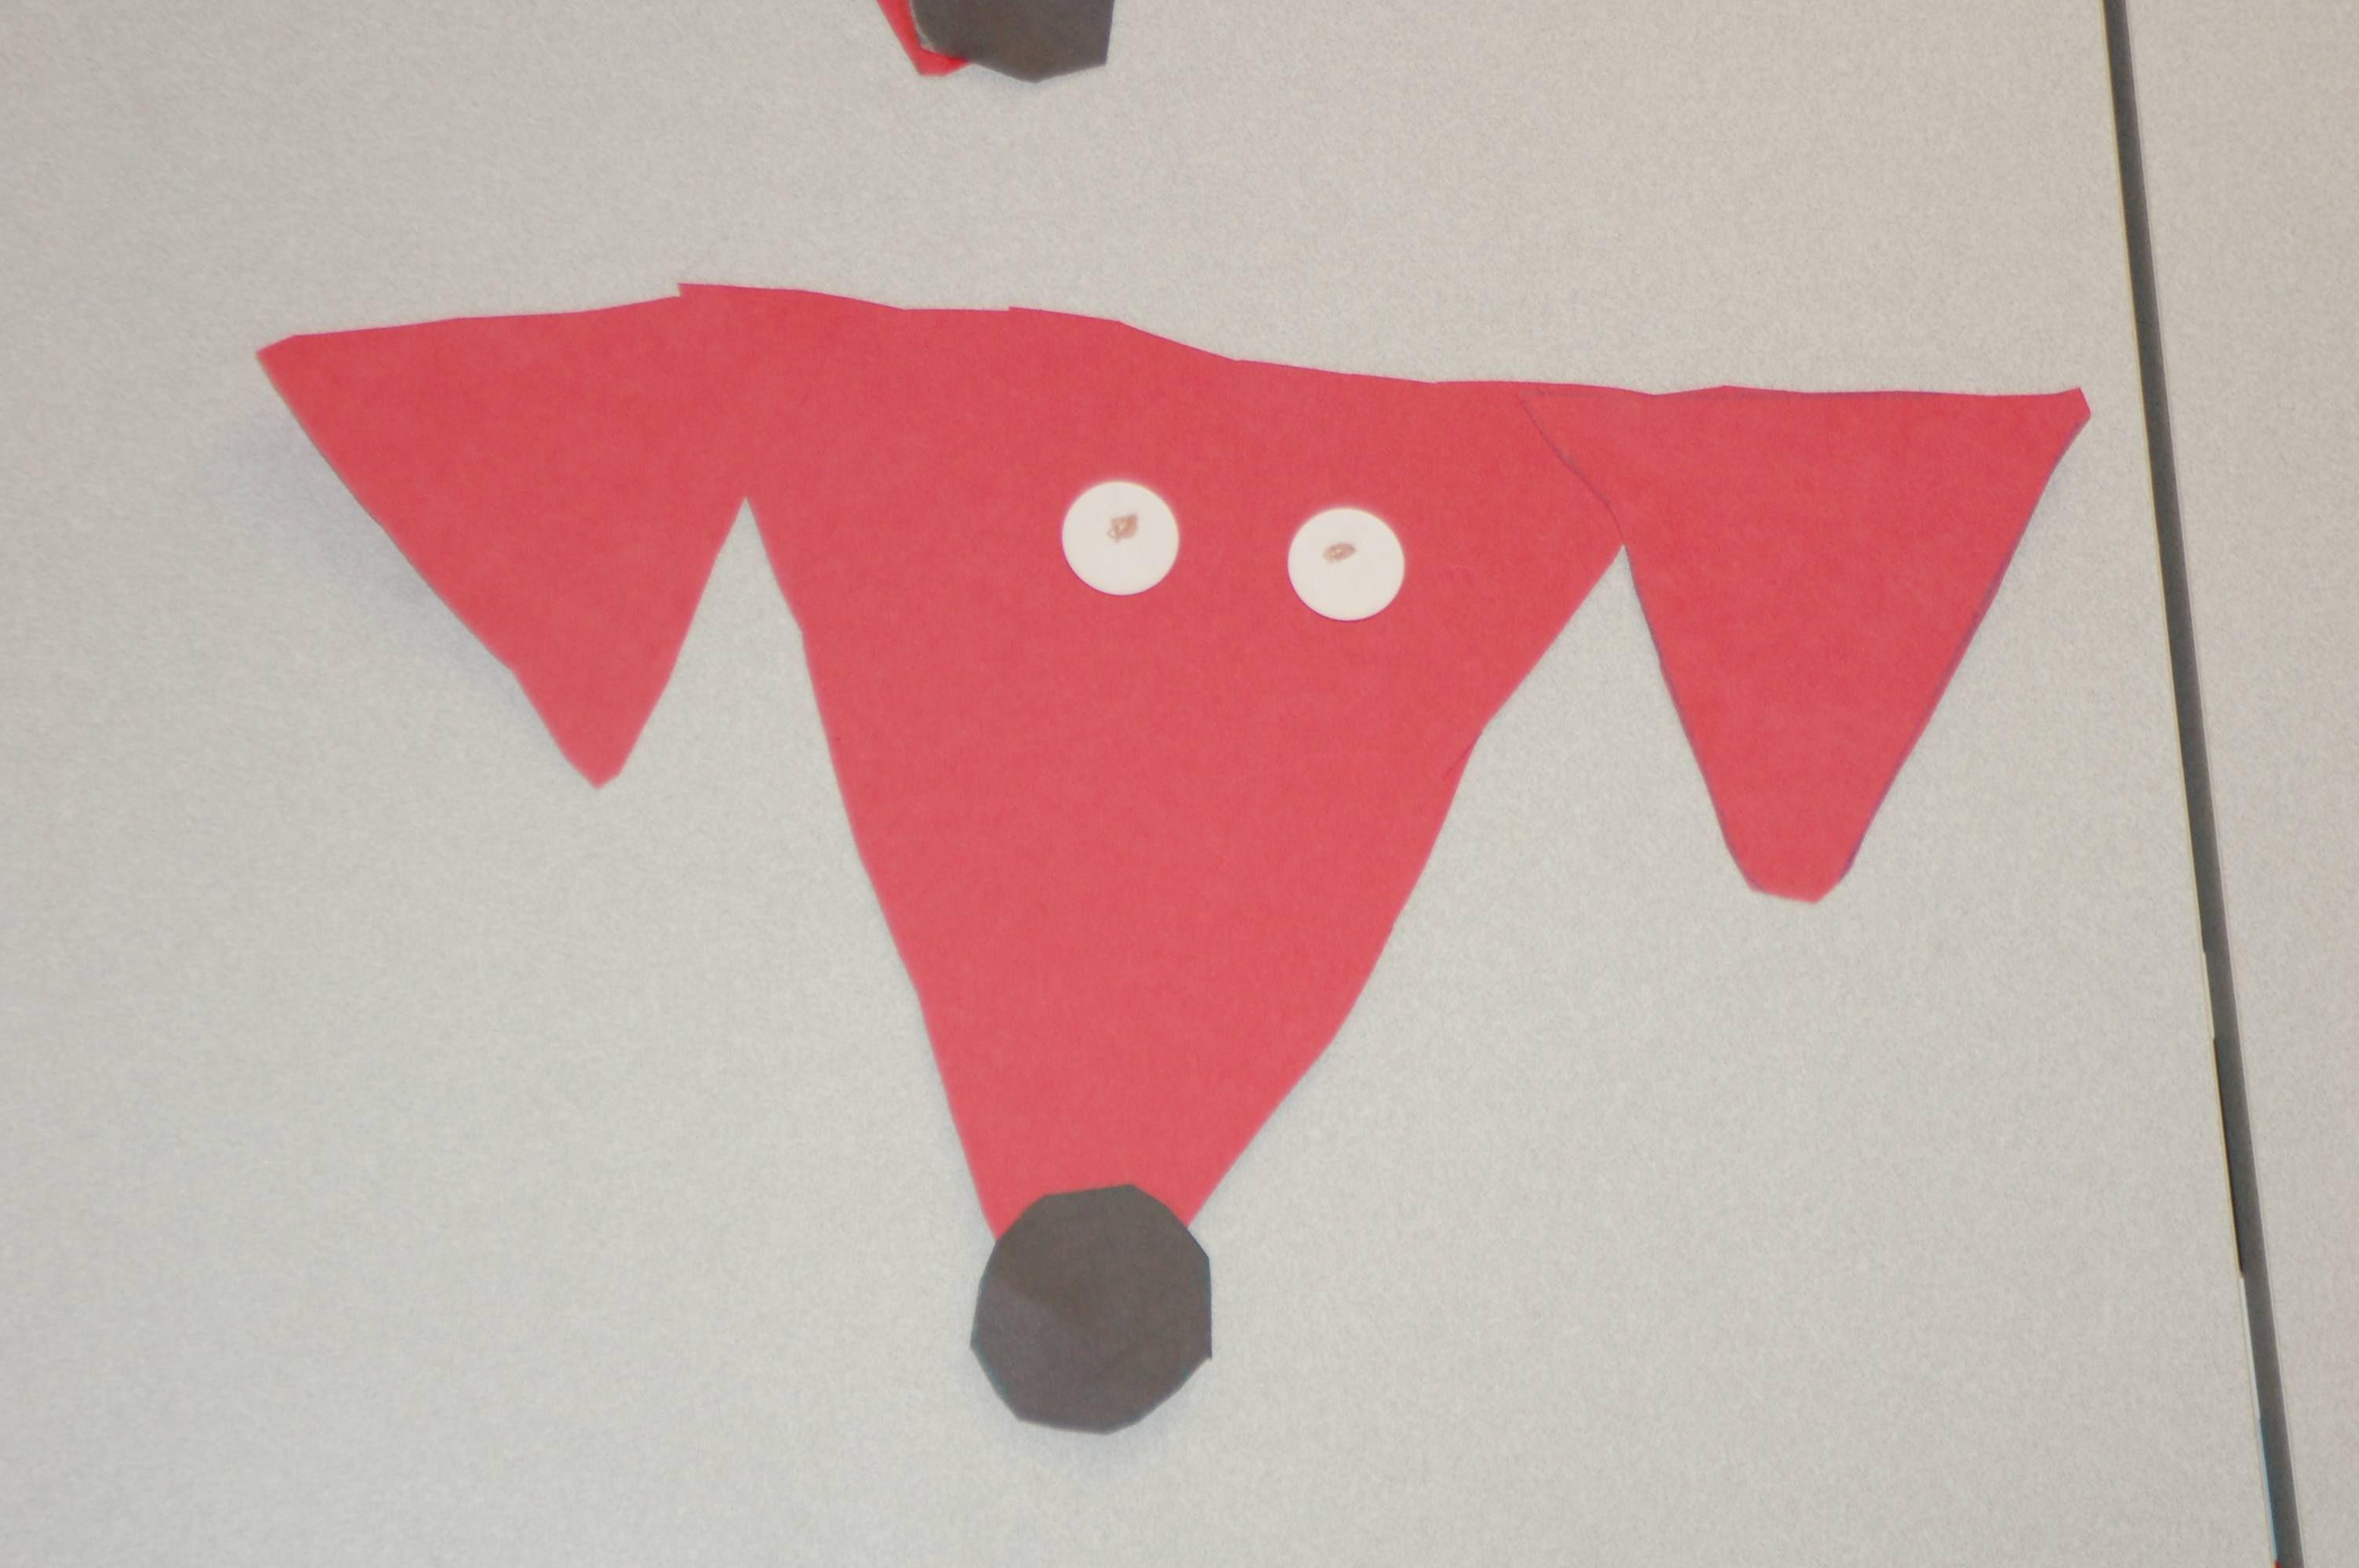 Big Red Triangle Dog